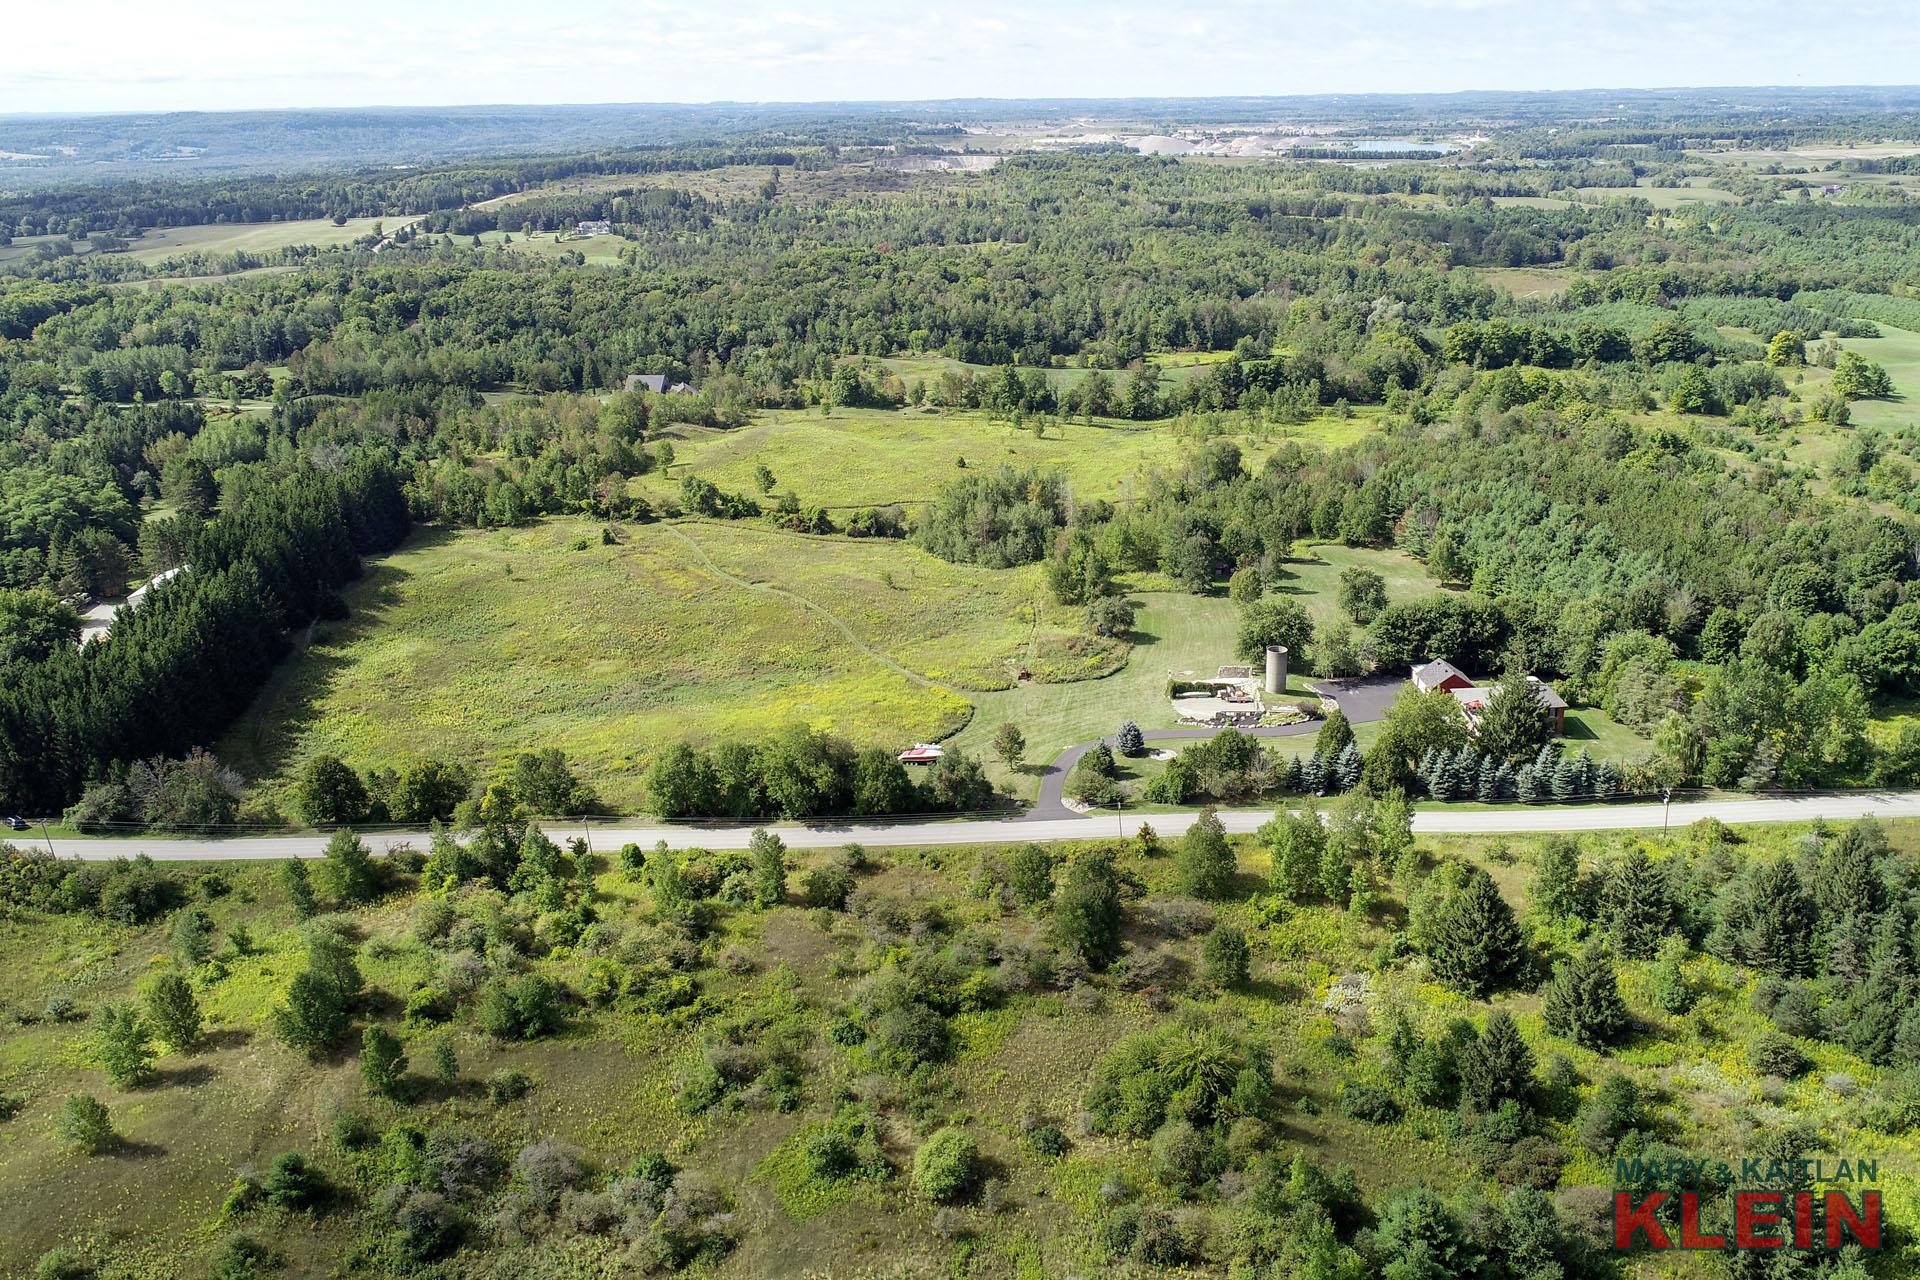 Gorgeous Caledon Escarpment Property for Sale, Klein, 30 Acres, 5 Bedroom home